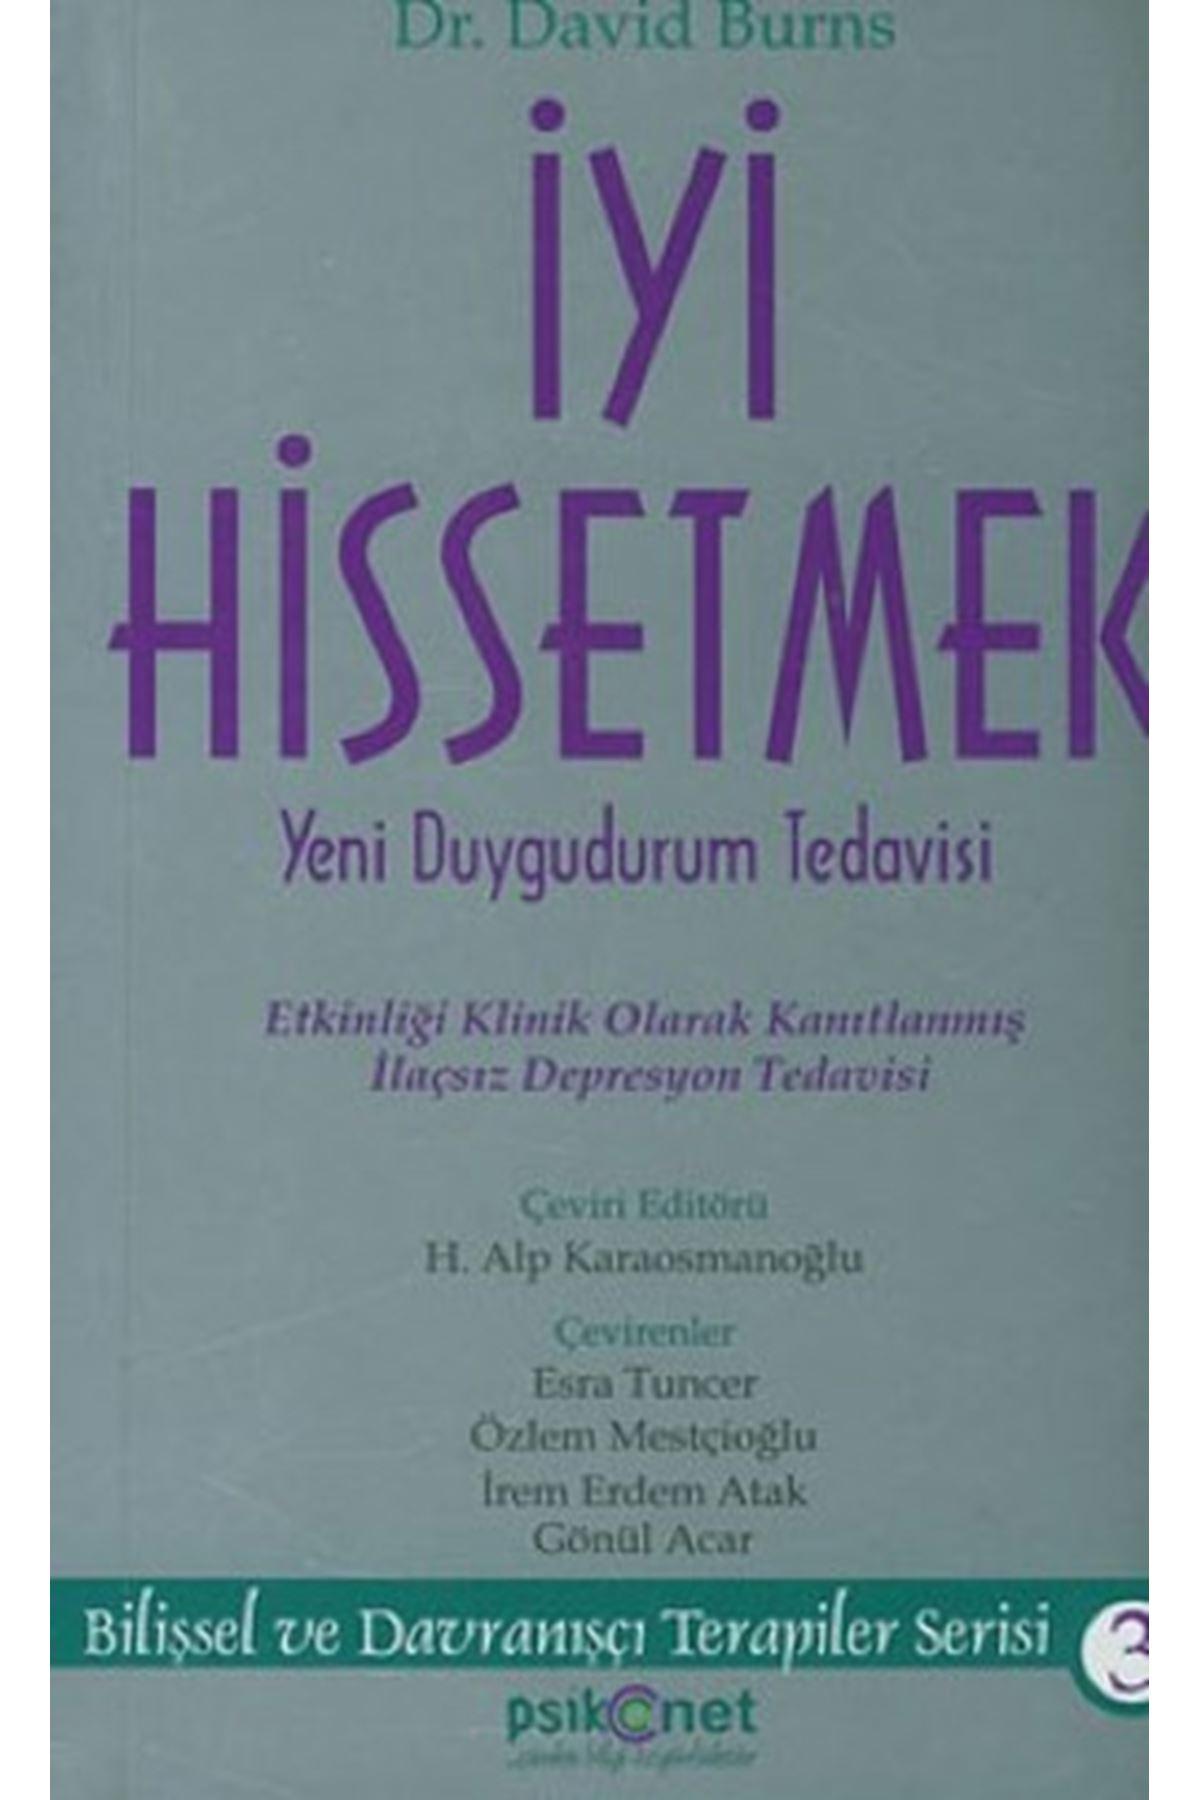 DAVİD BURNS - İYİ HİSSETMEK